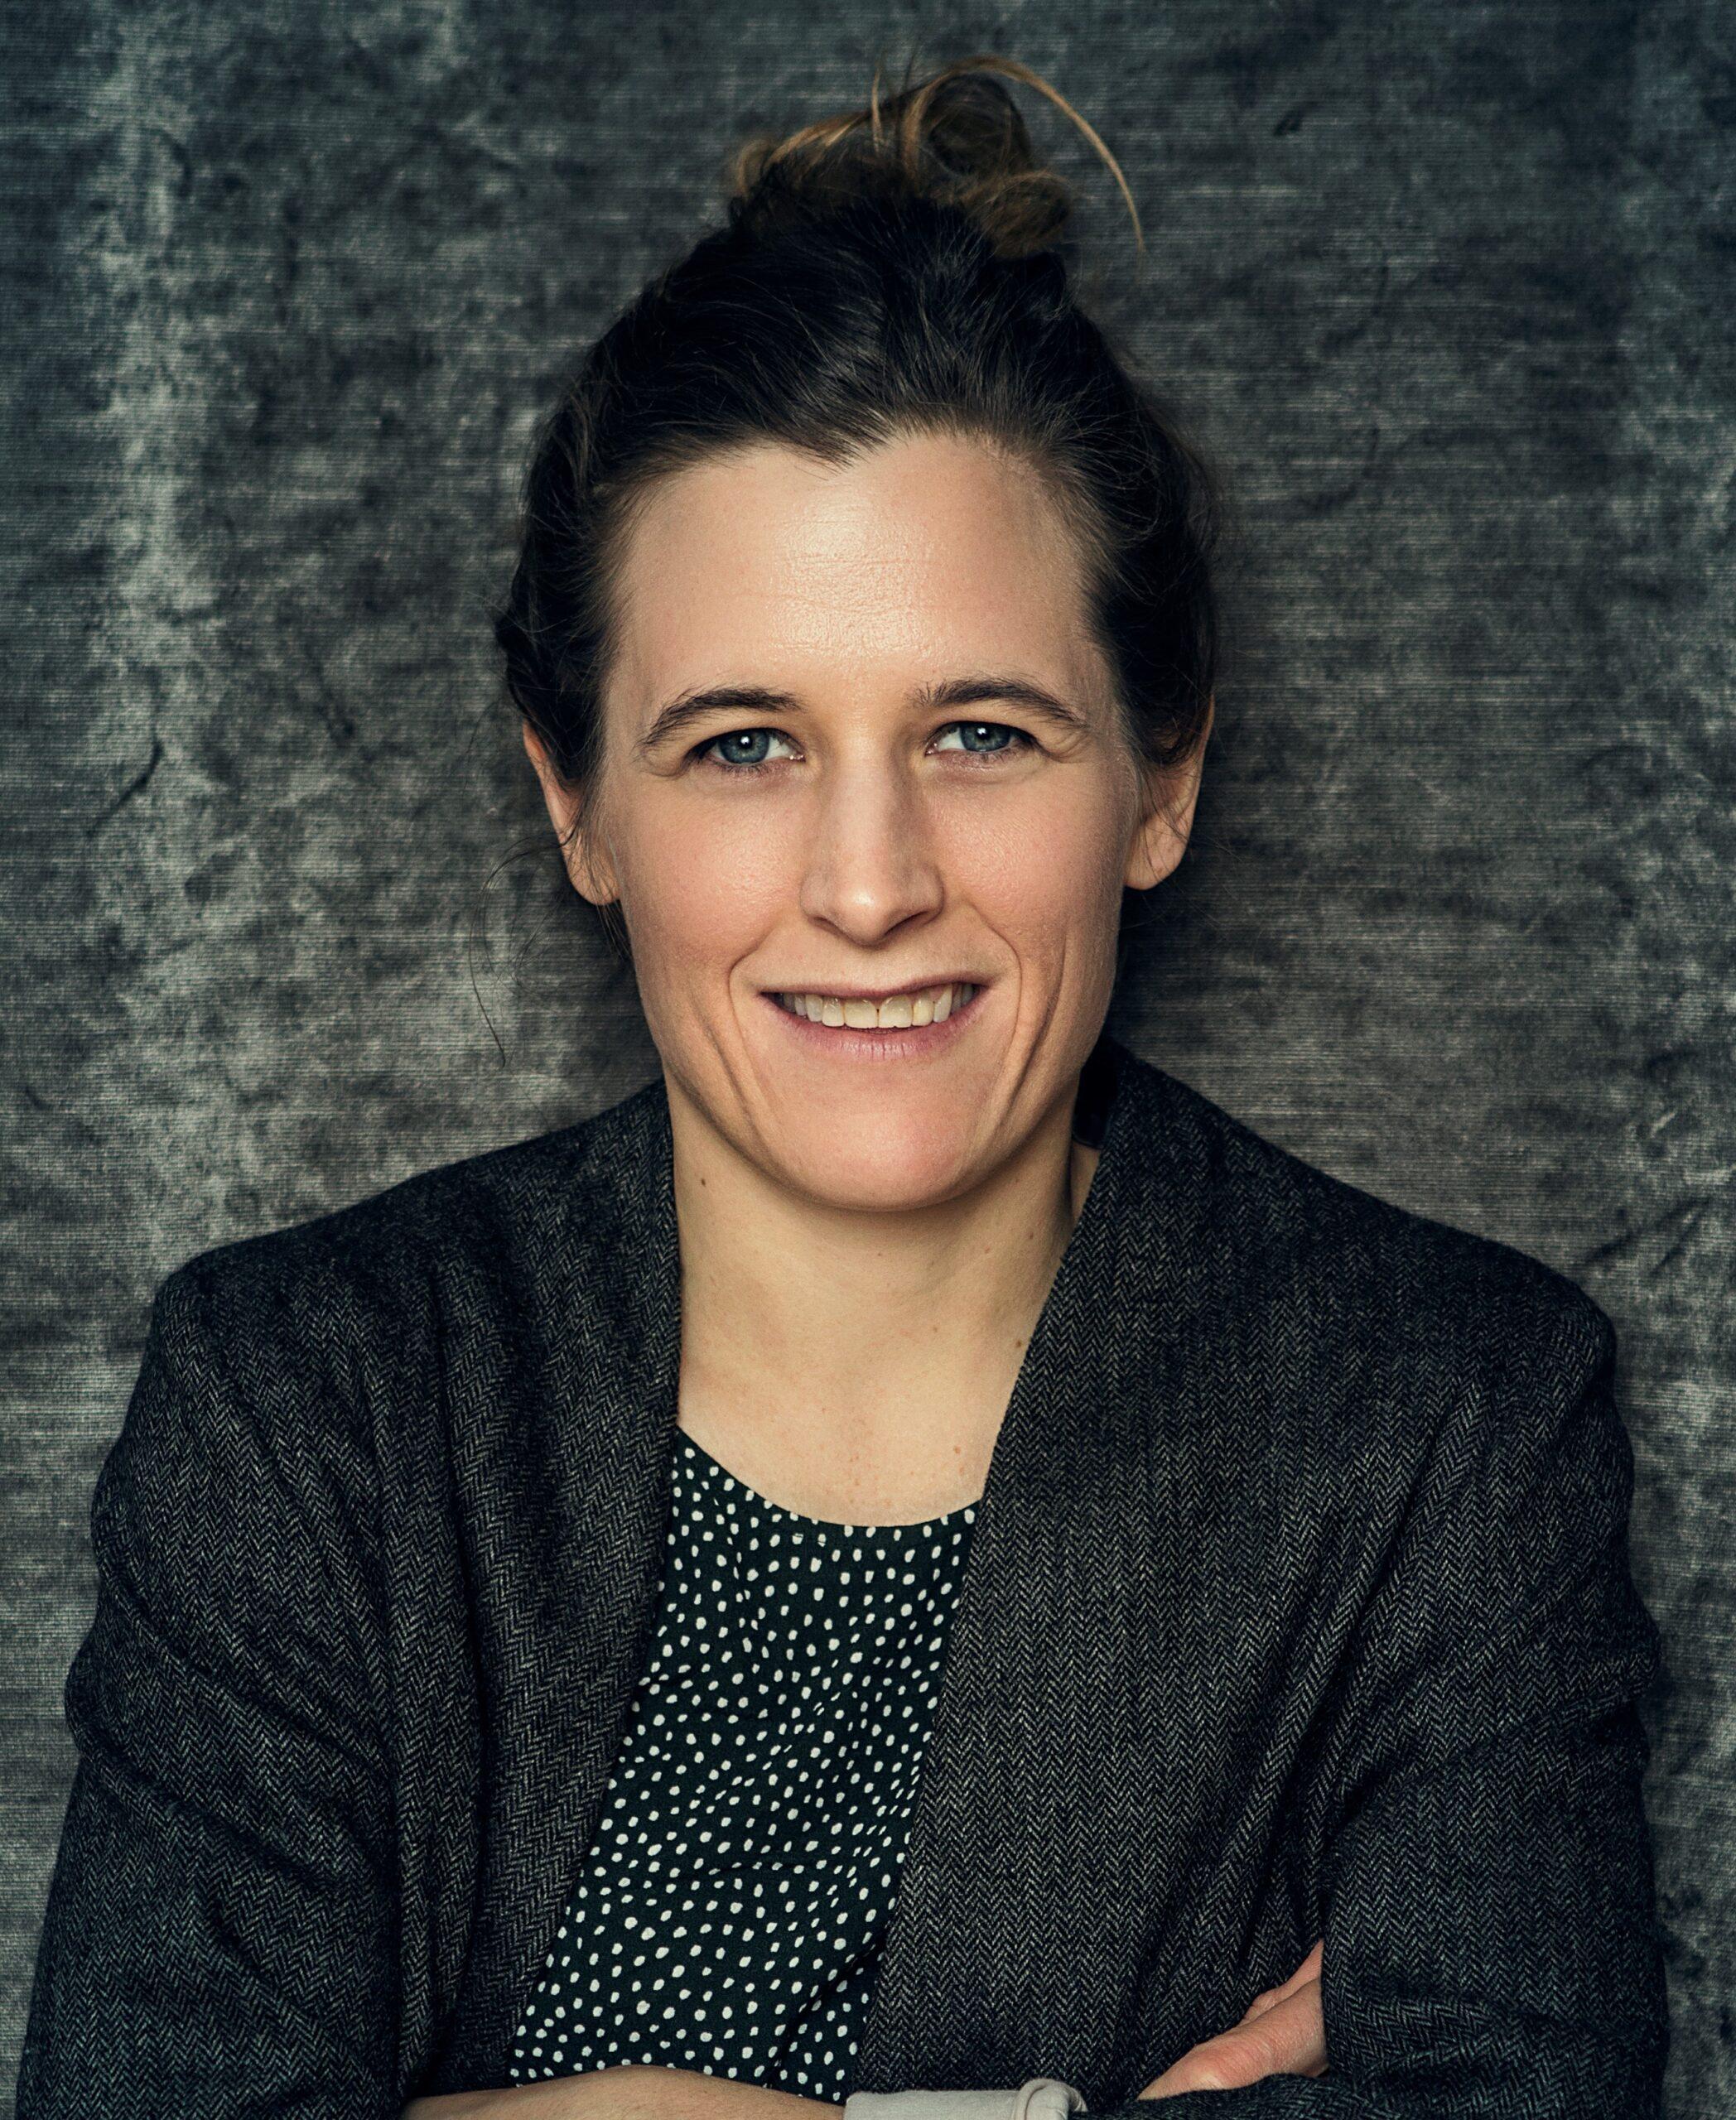 Marisa Schlenker